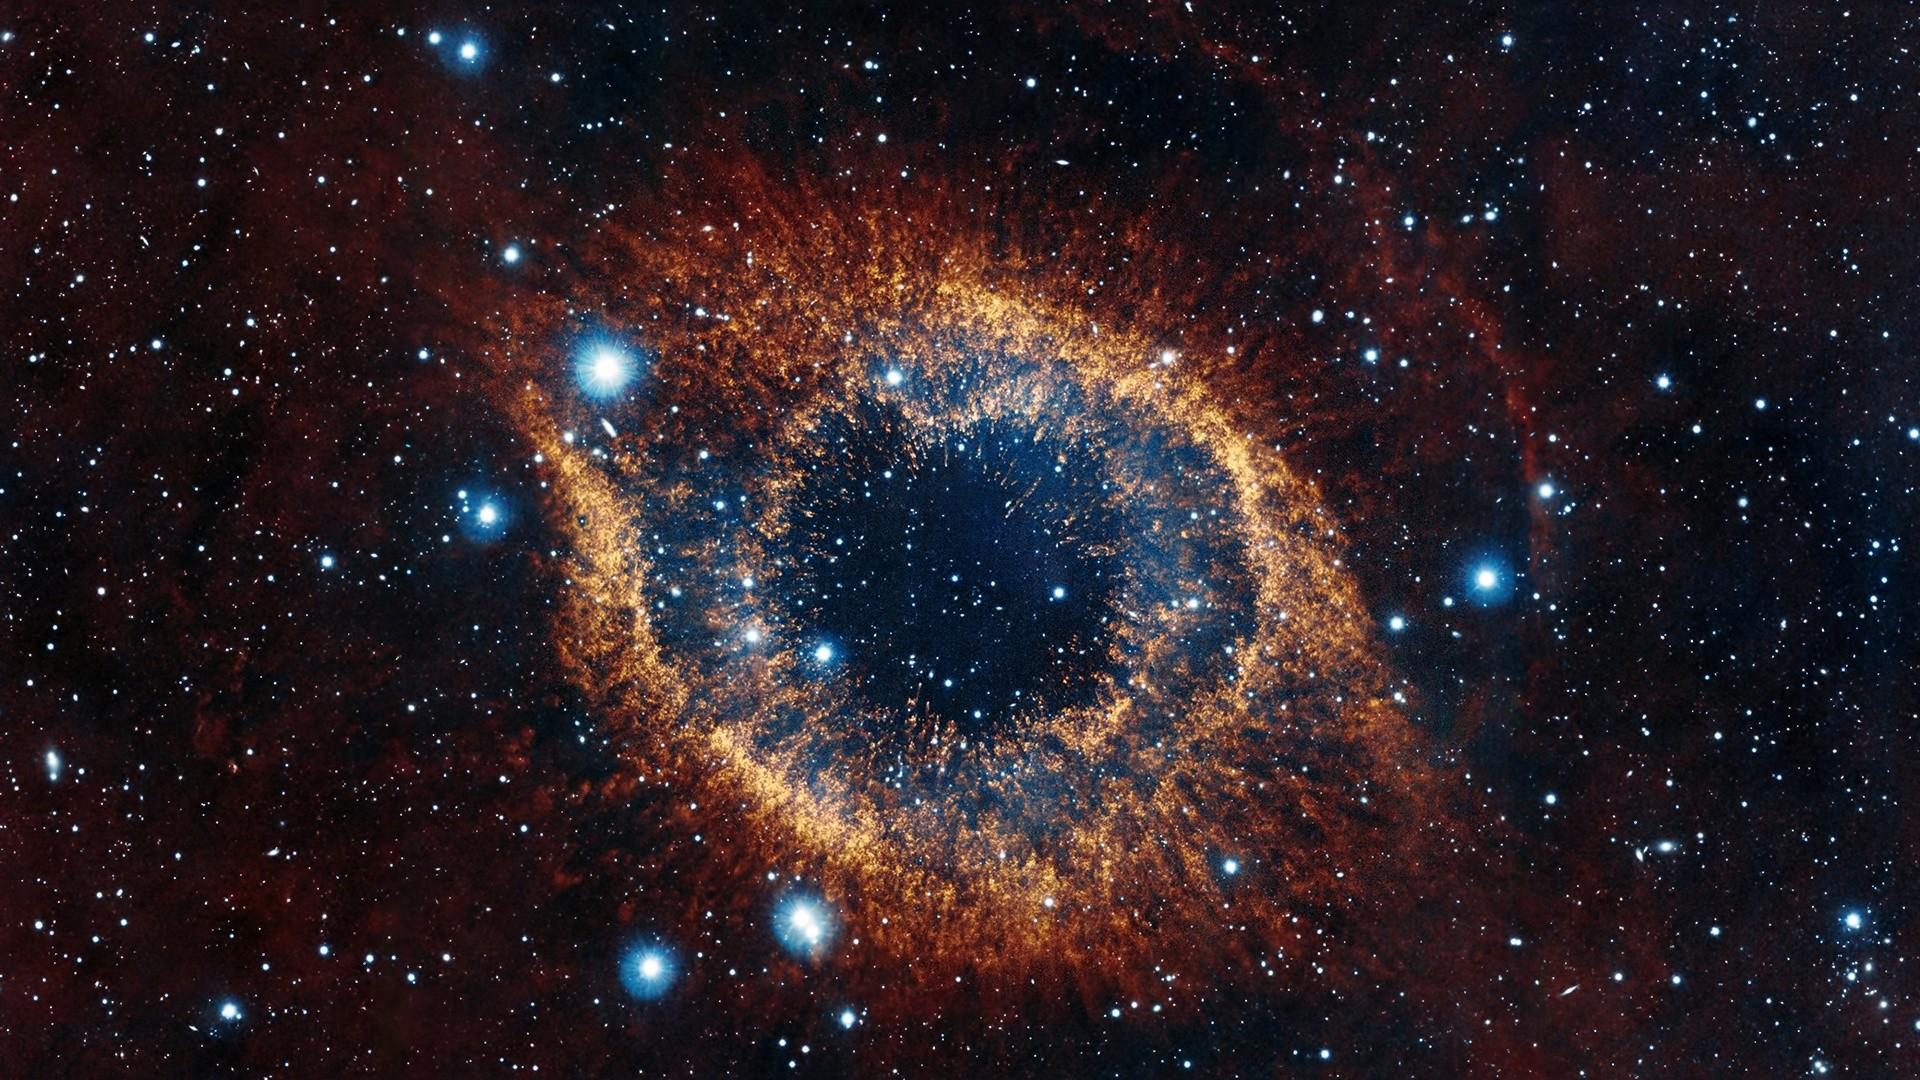 3132x1572 Hubble Pillars Of Creation Wallpaper Wallpapersafari Eagle Nebula